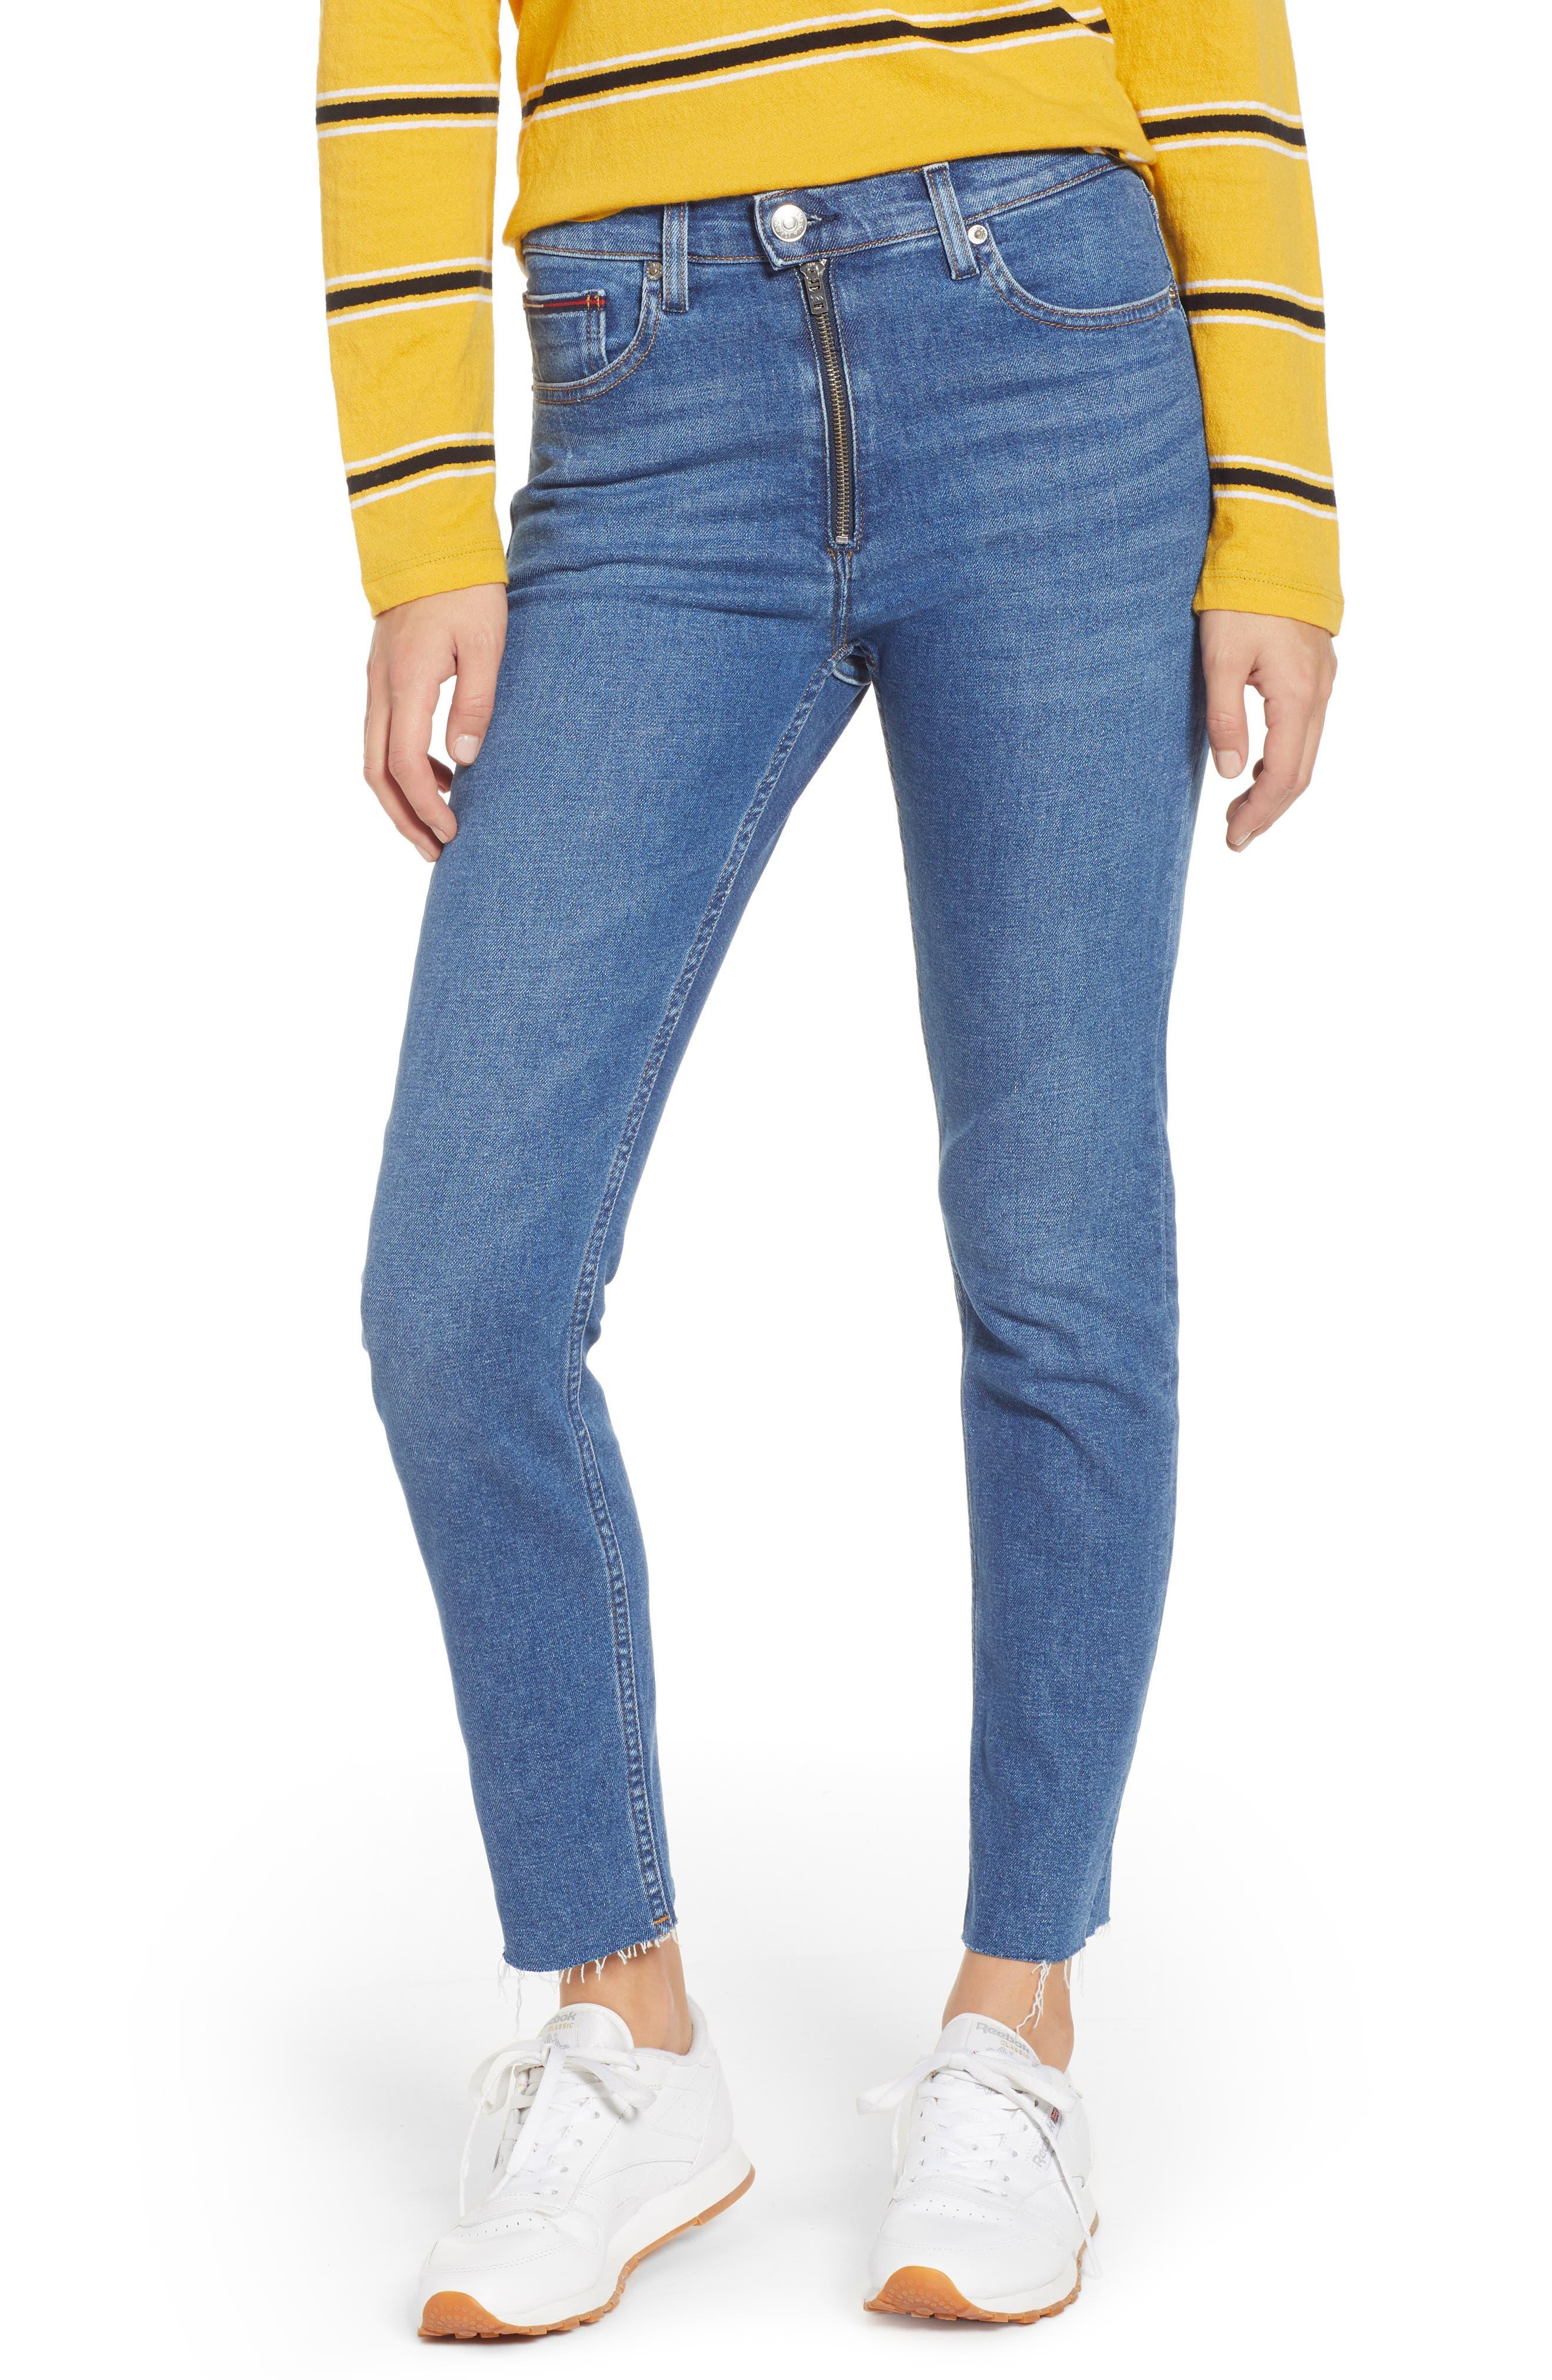 Izzy High Waist Slim Crop Jeans,                             Main thumbnail 1, color,                             400